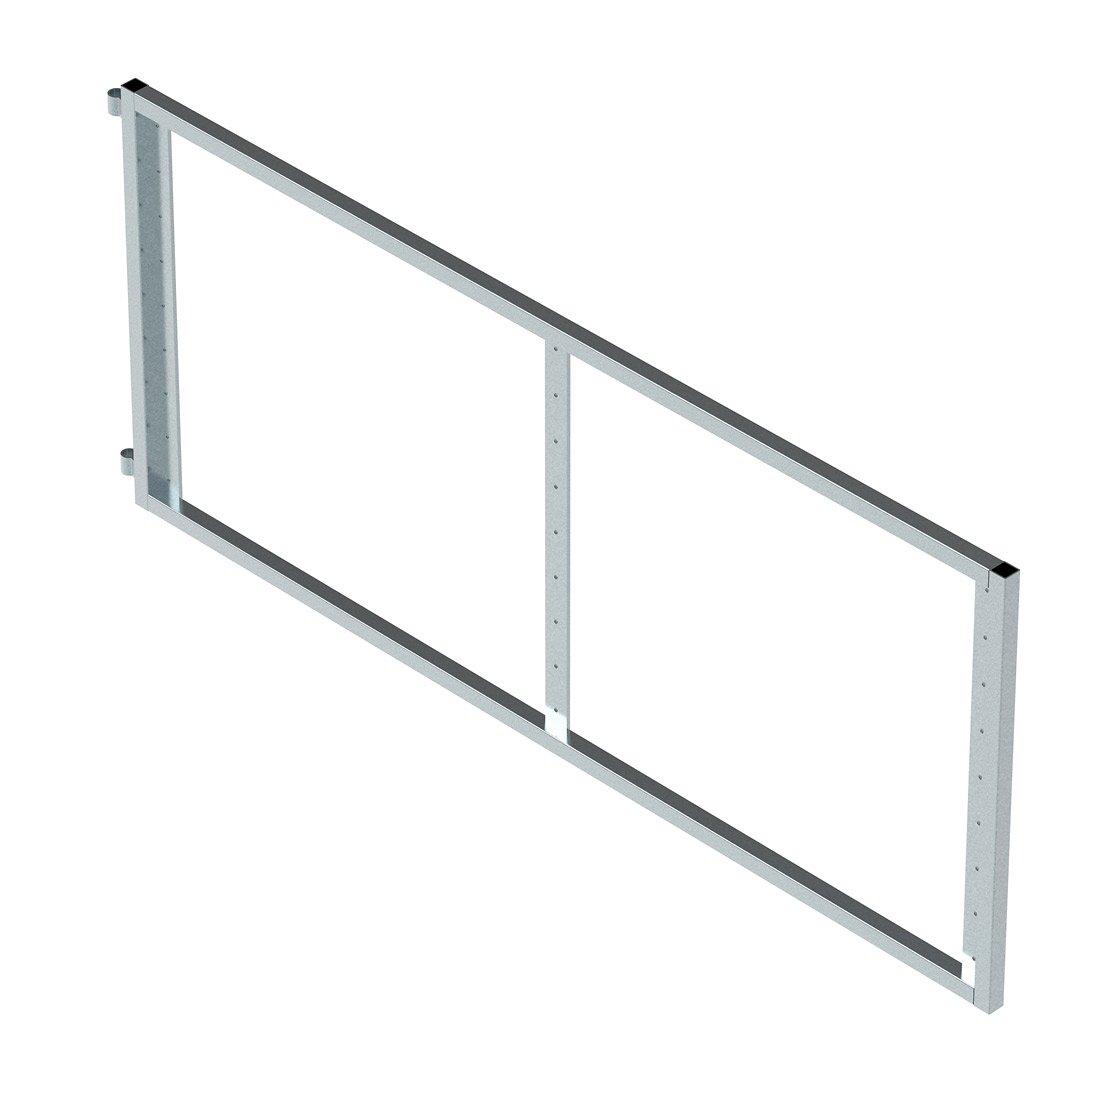 Sheepyard gate 2000mm x 850mm (frame only)